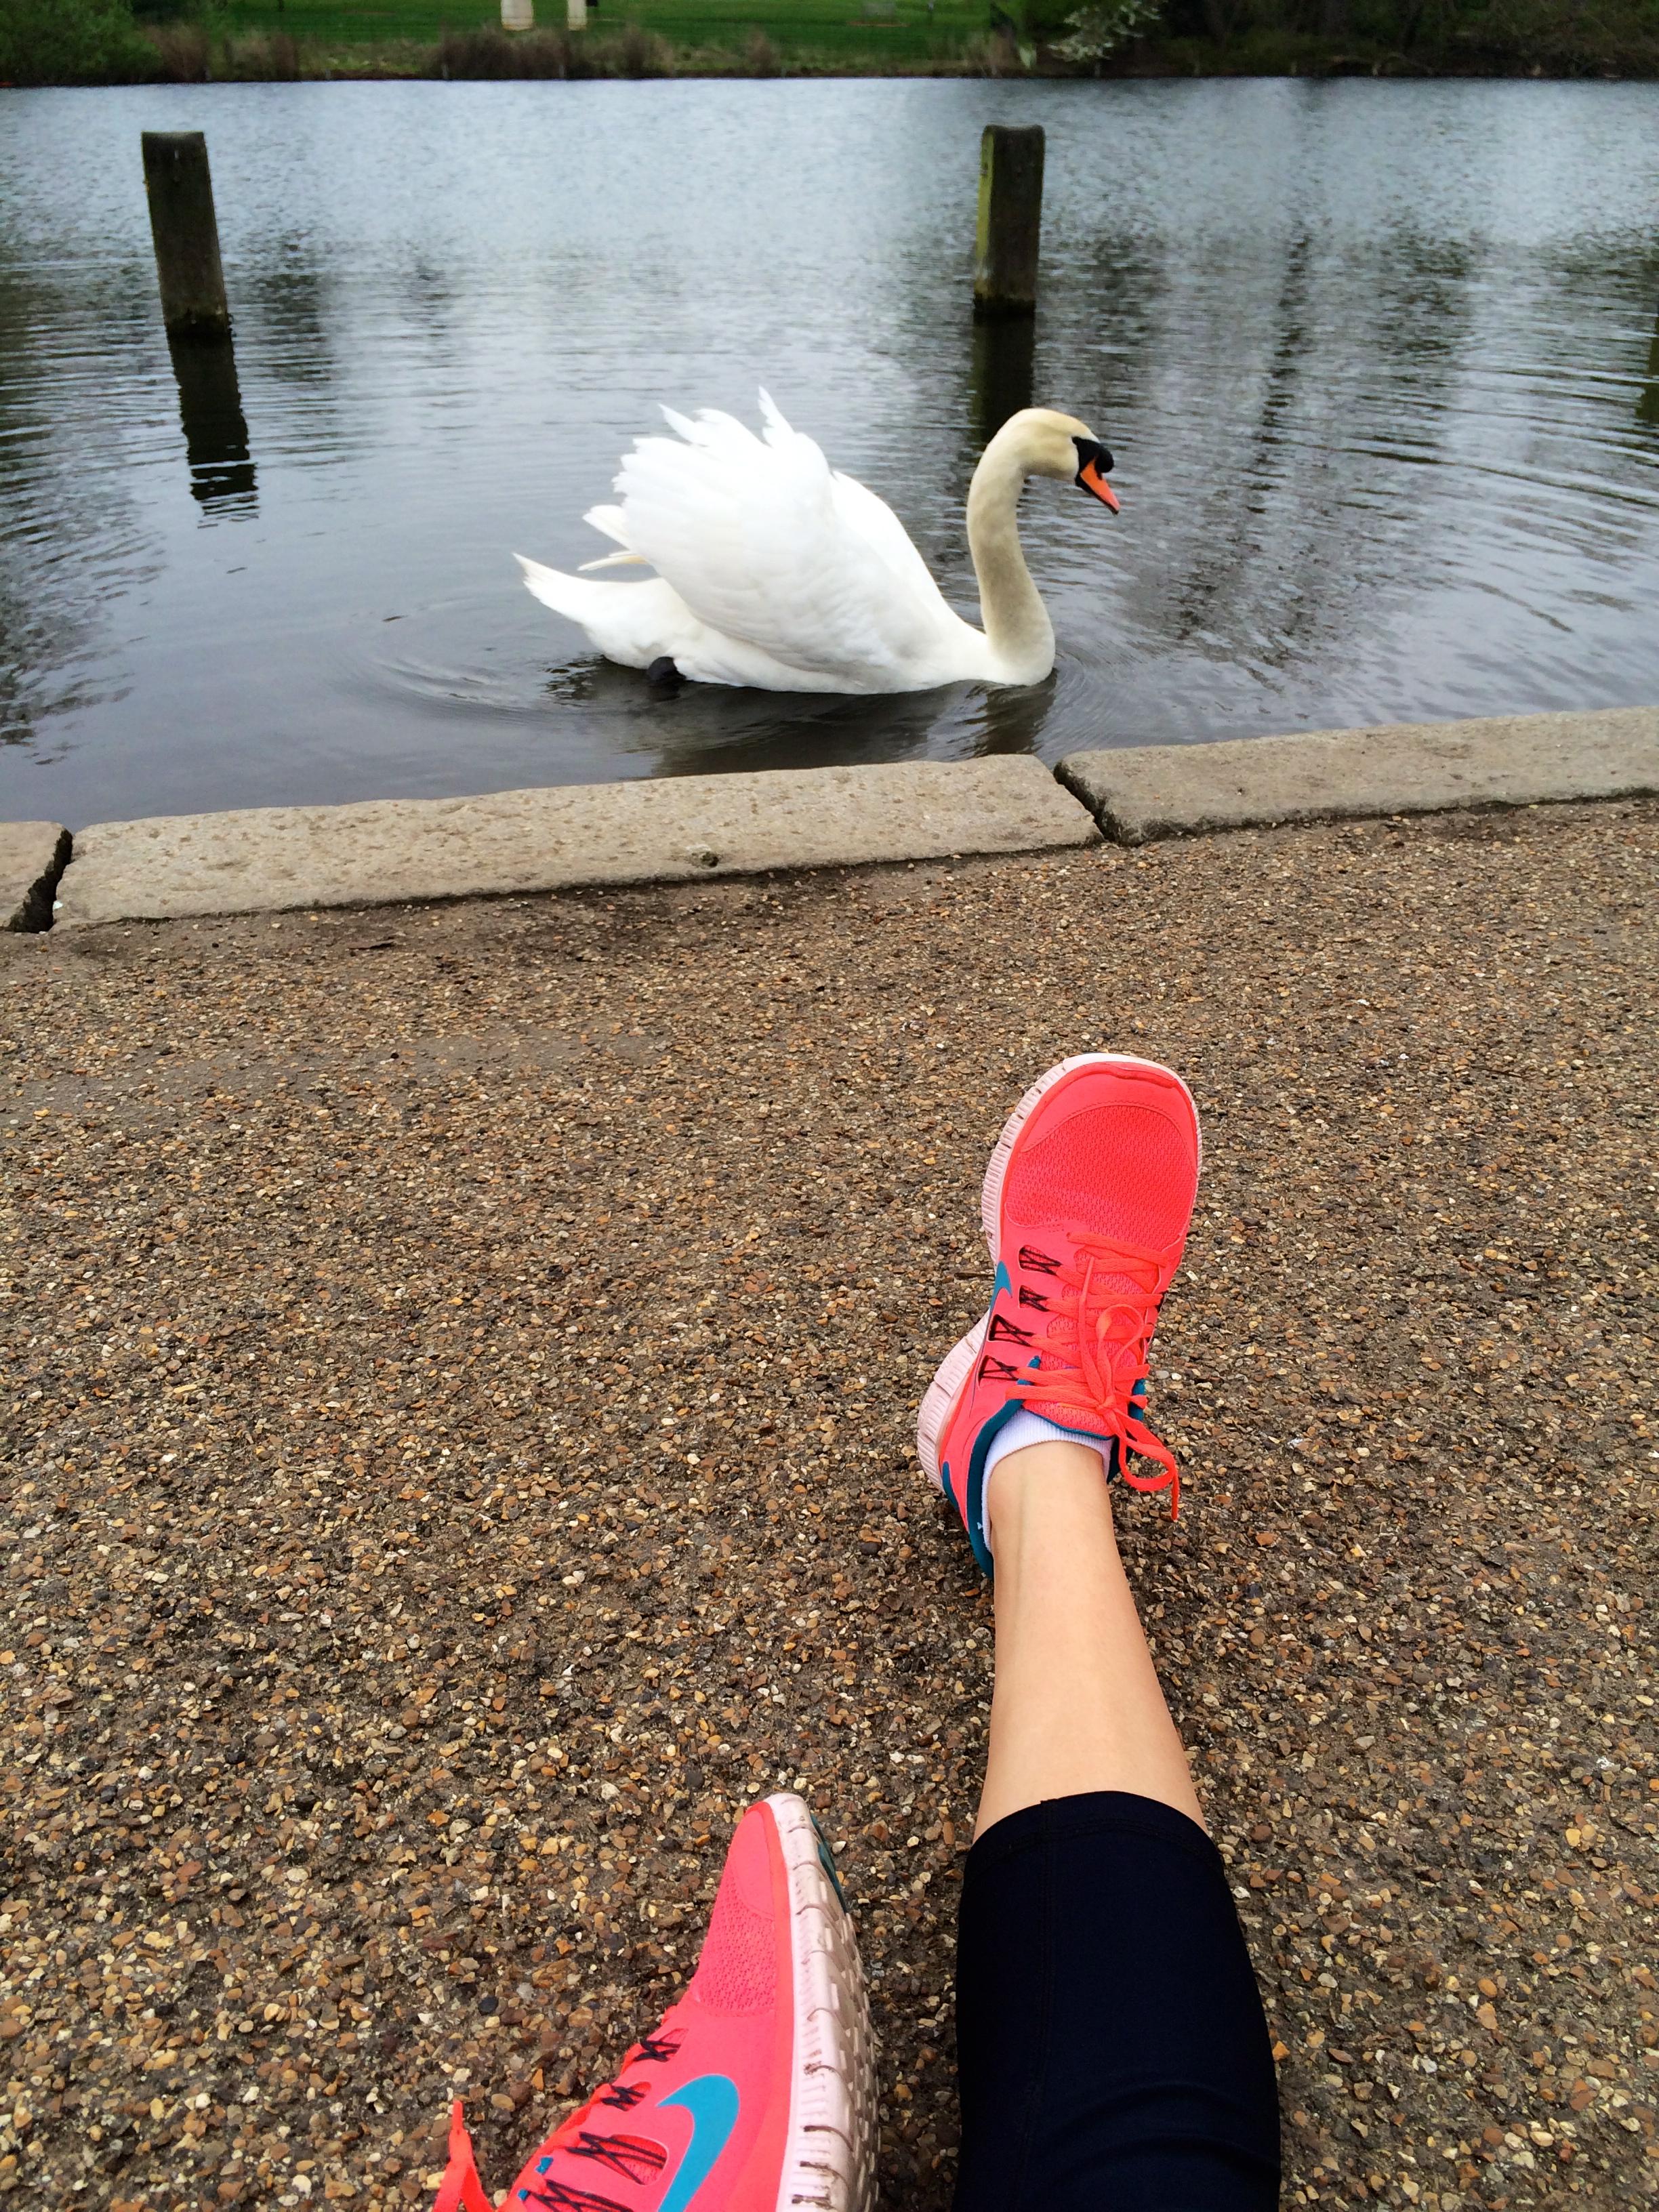 CAPAStudyAbroad_London_Spring2014_Morning_Run_through_Kensington_Gardens_by_Sophia_Love